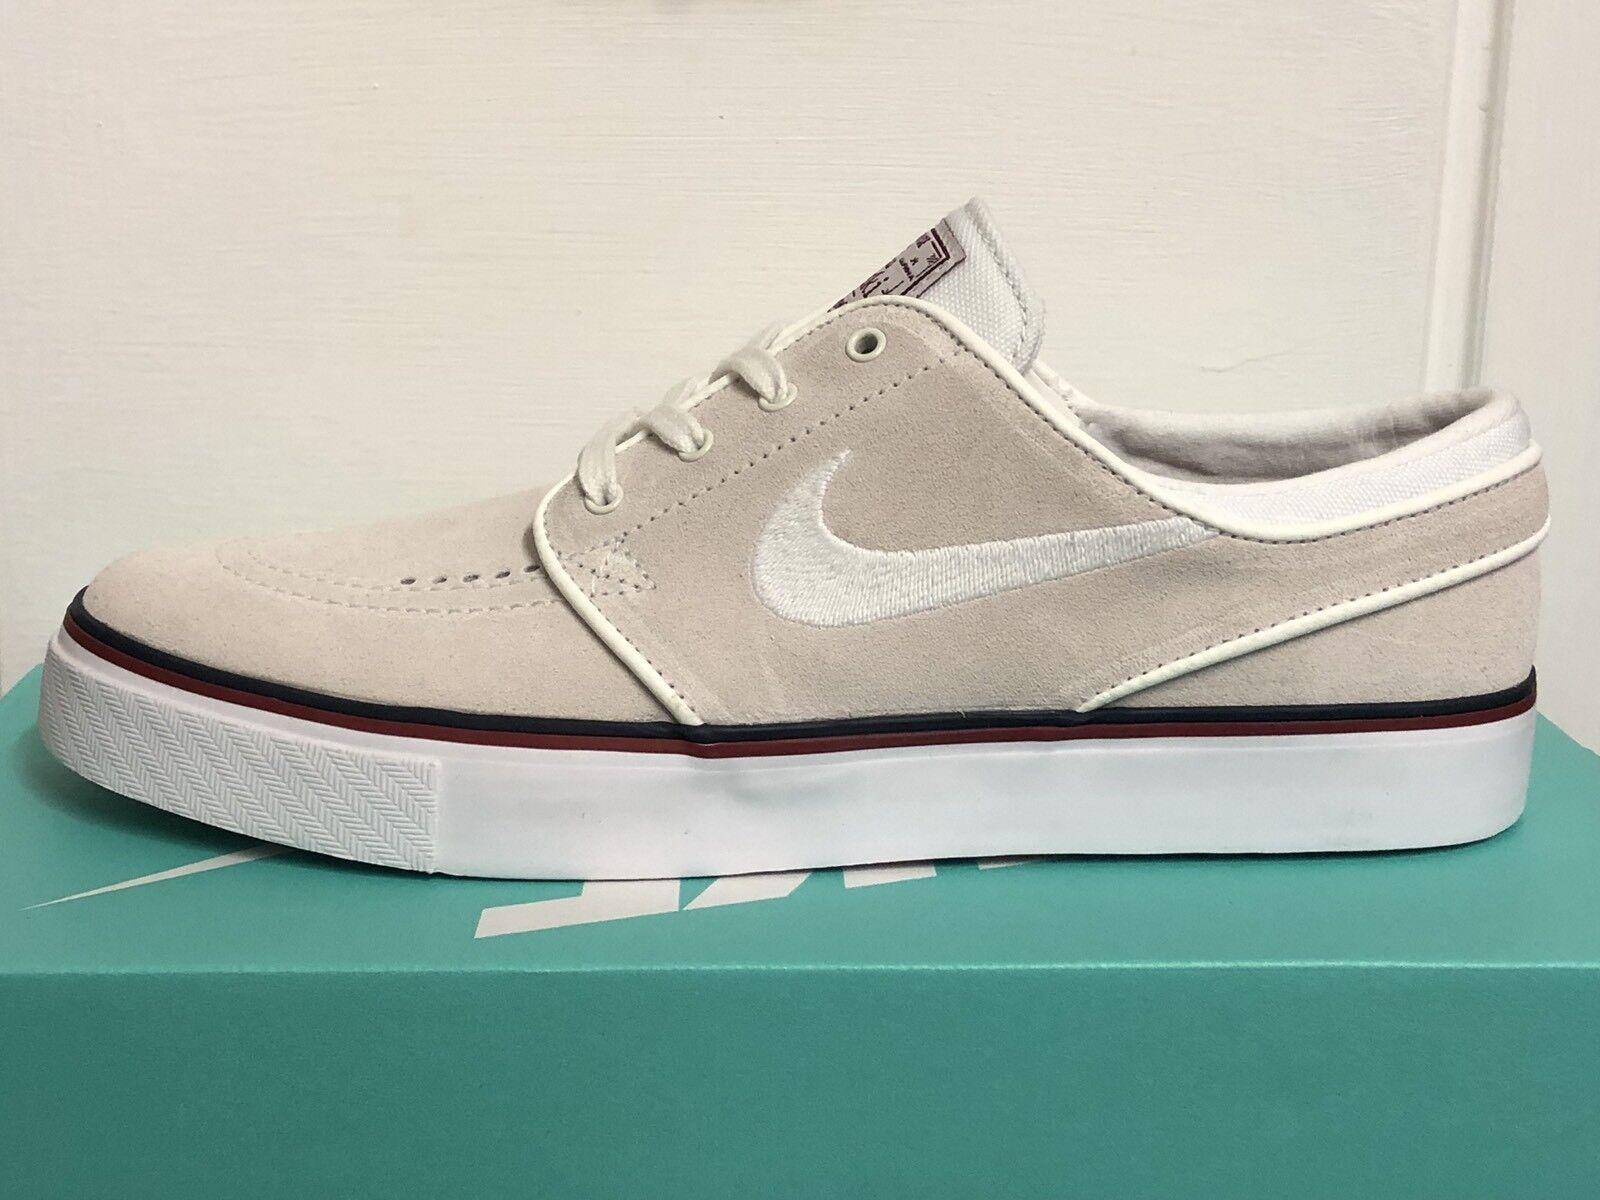 NIKE Womens SB ZOOM STEFAN JANOSKI  Trainers SNEAKERS Shoes6,5 EUR 40,5